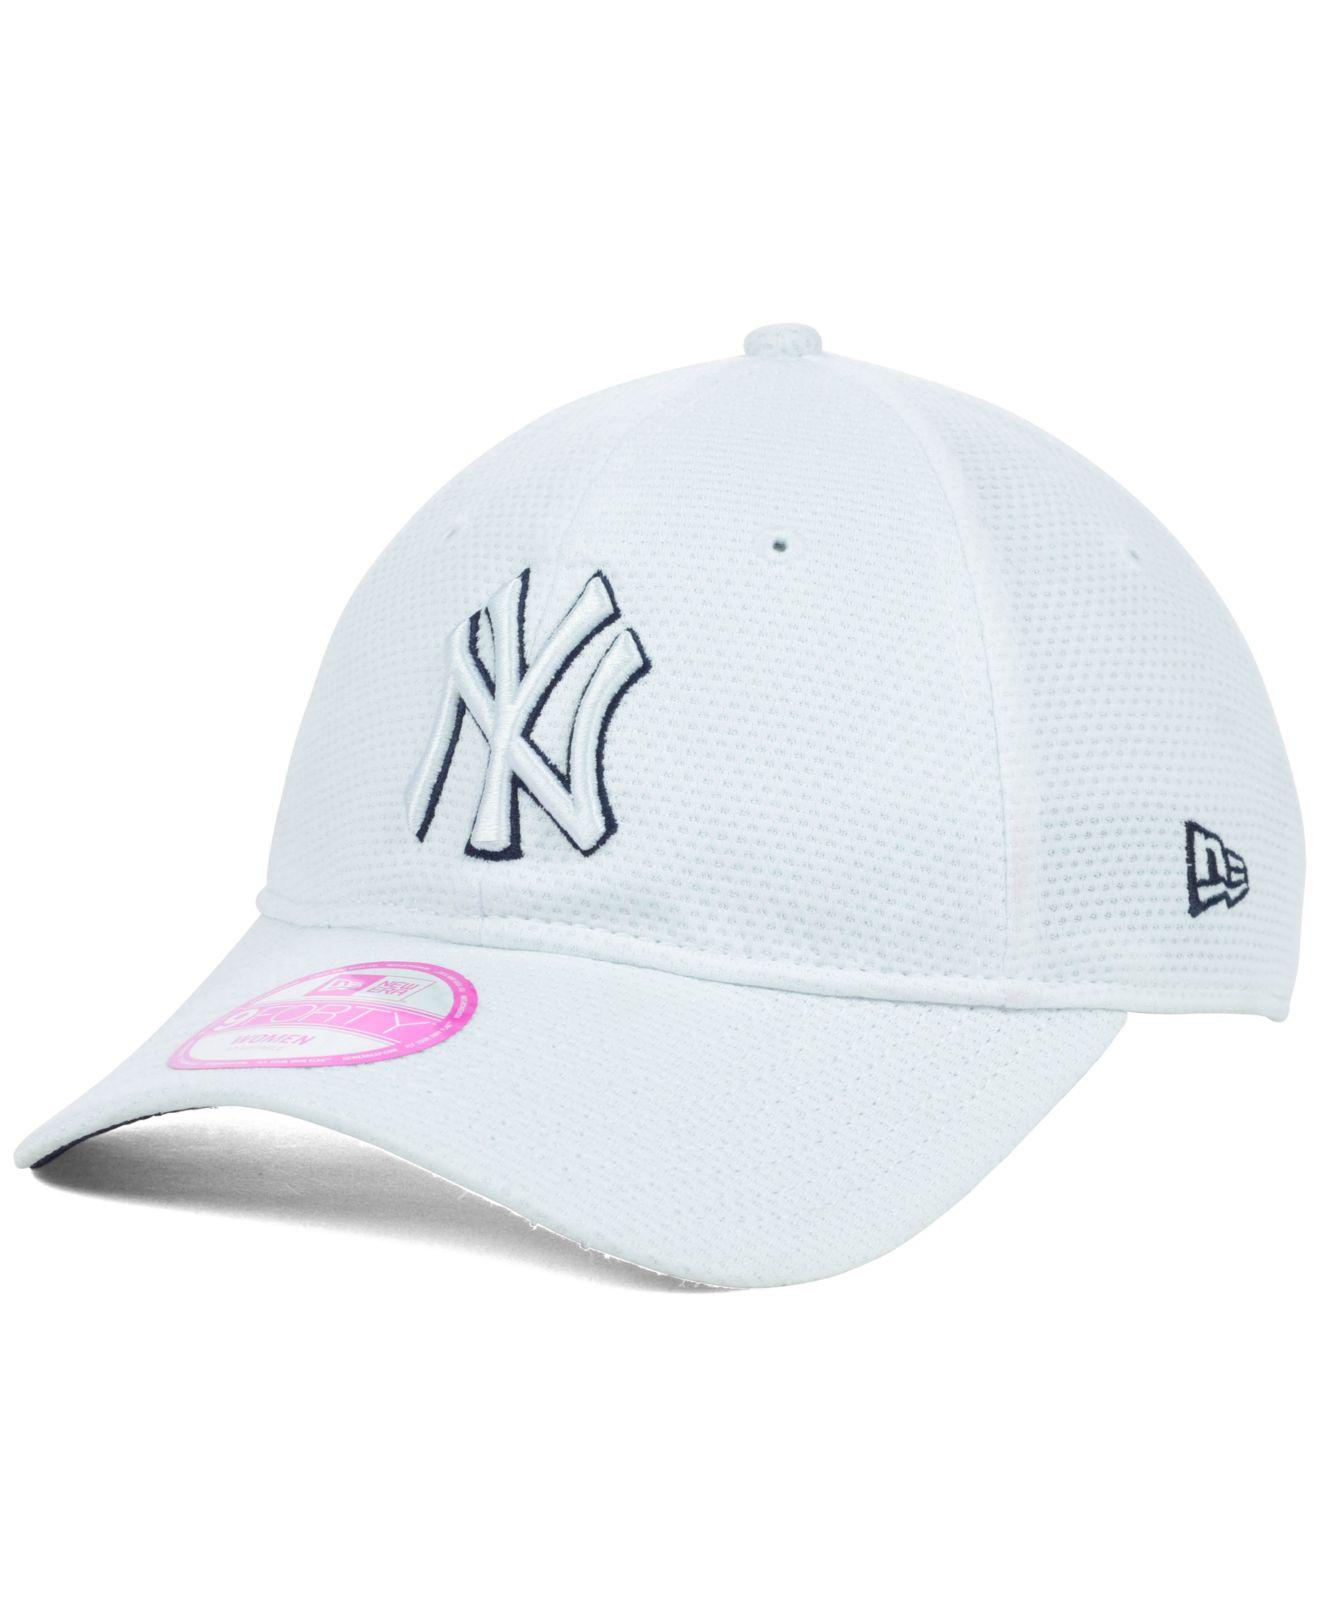 baa0911bf67ec5 KTZ Women'S New York Yankees Tech Essential 9Forty Cap in White - Lyst